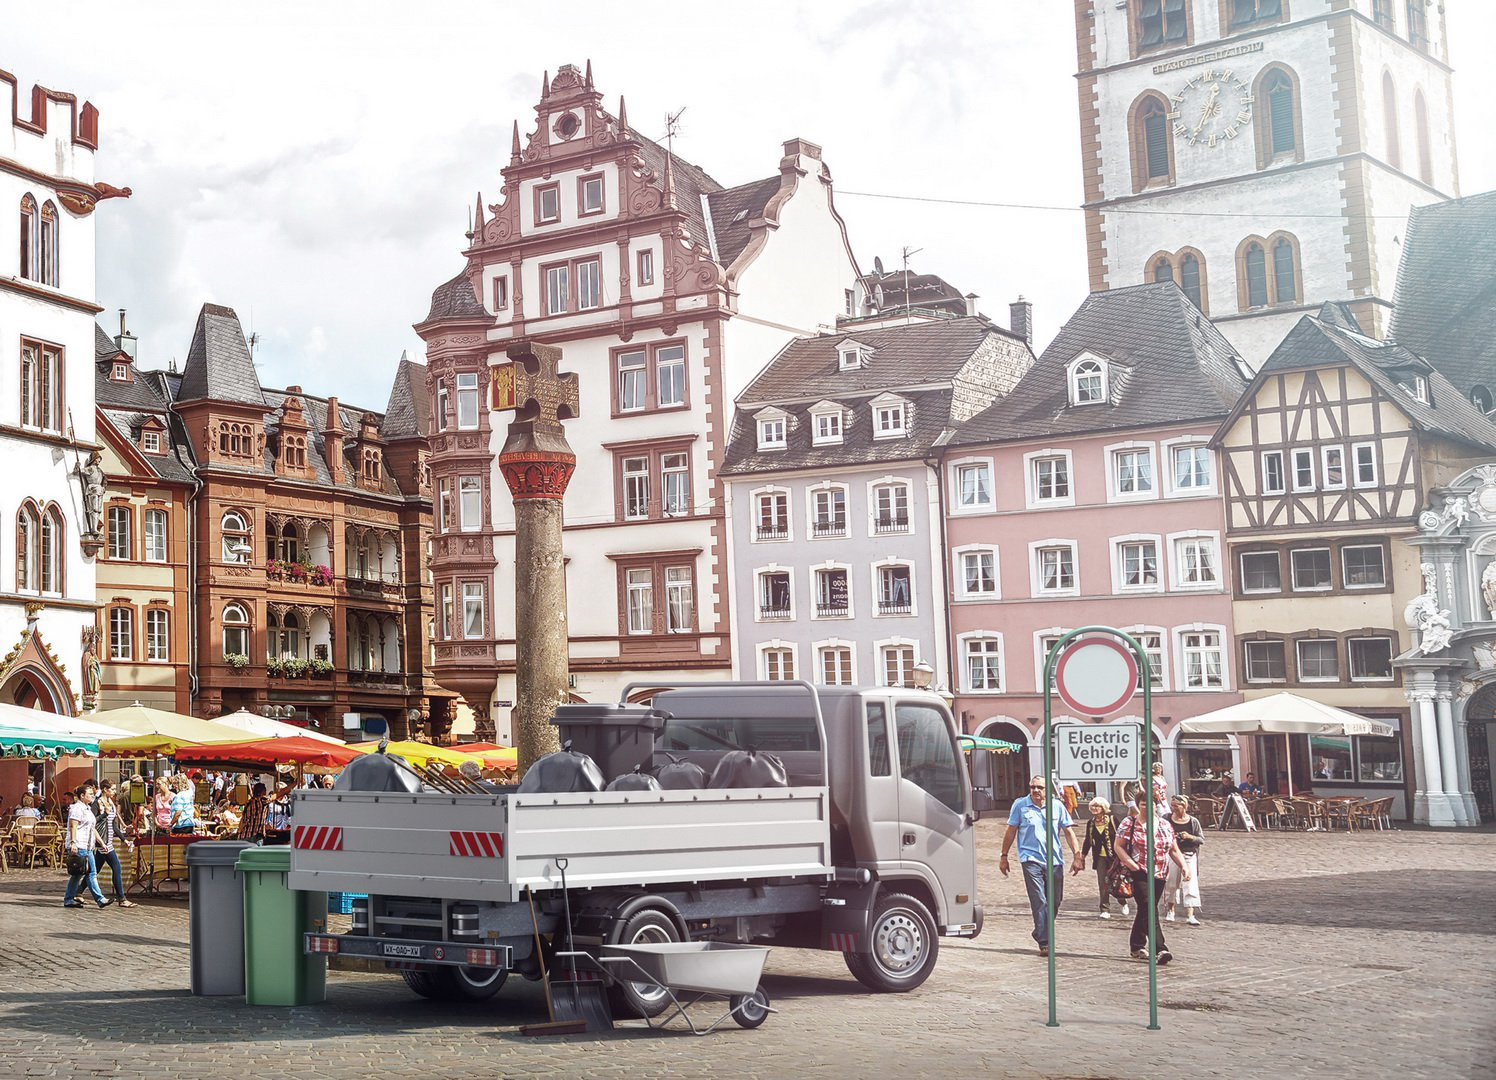 59cc6b31-2019-bosch-ecity-truck-2